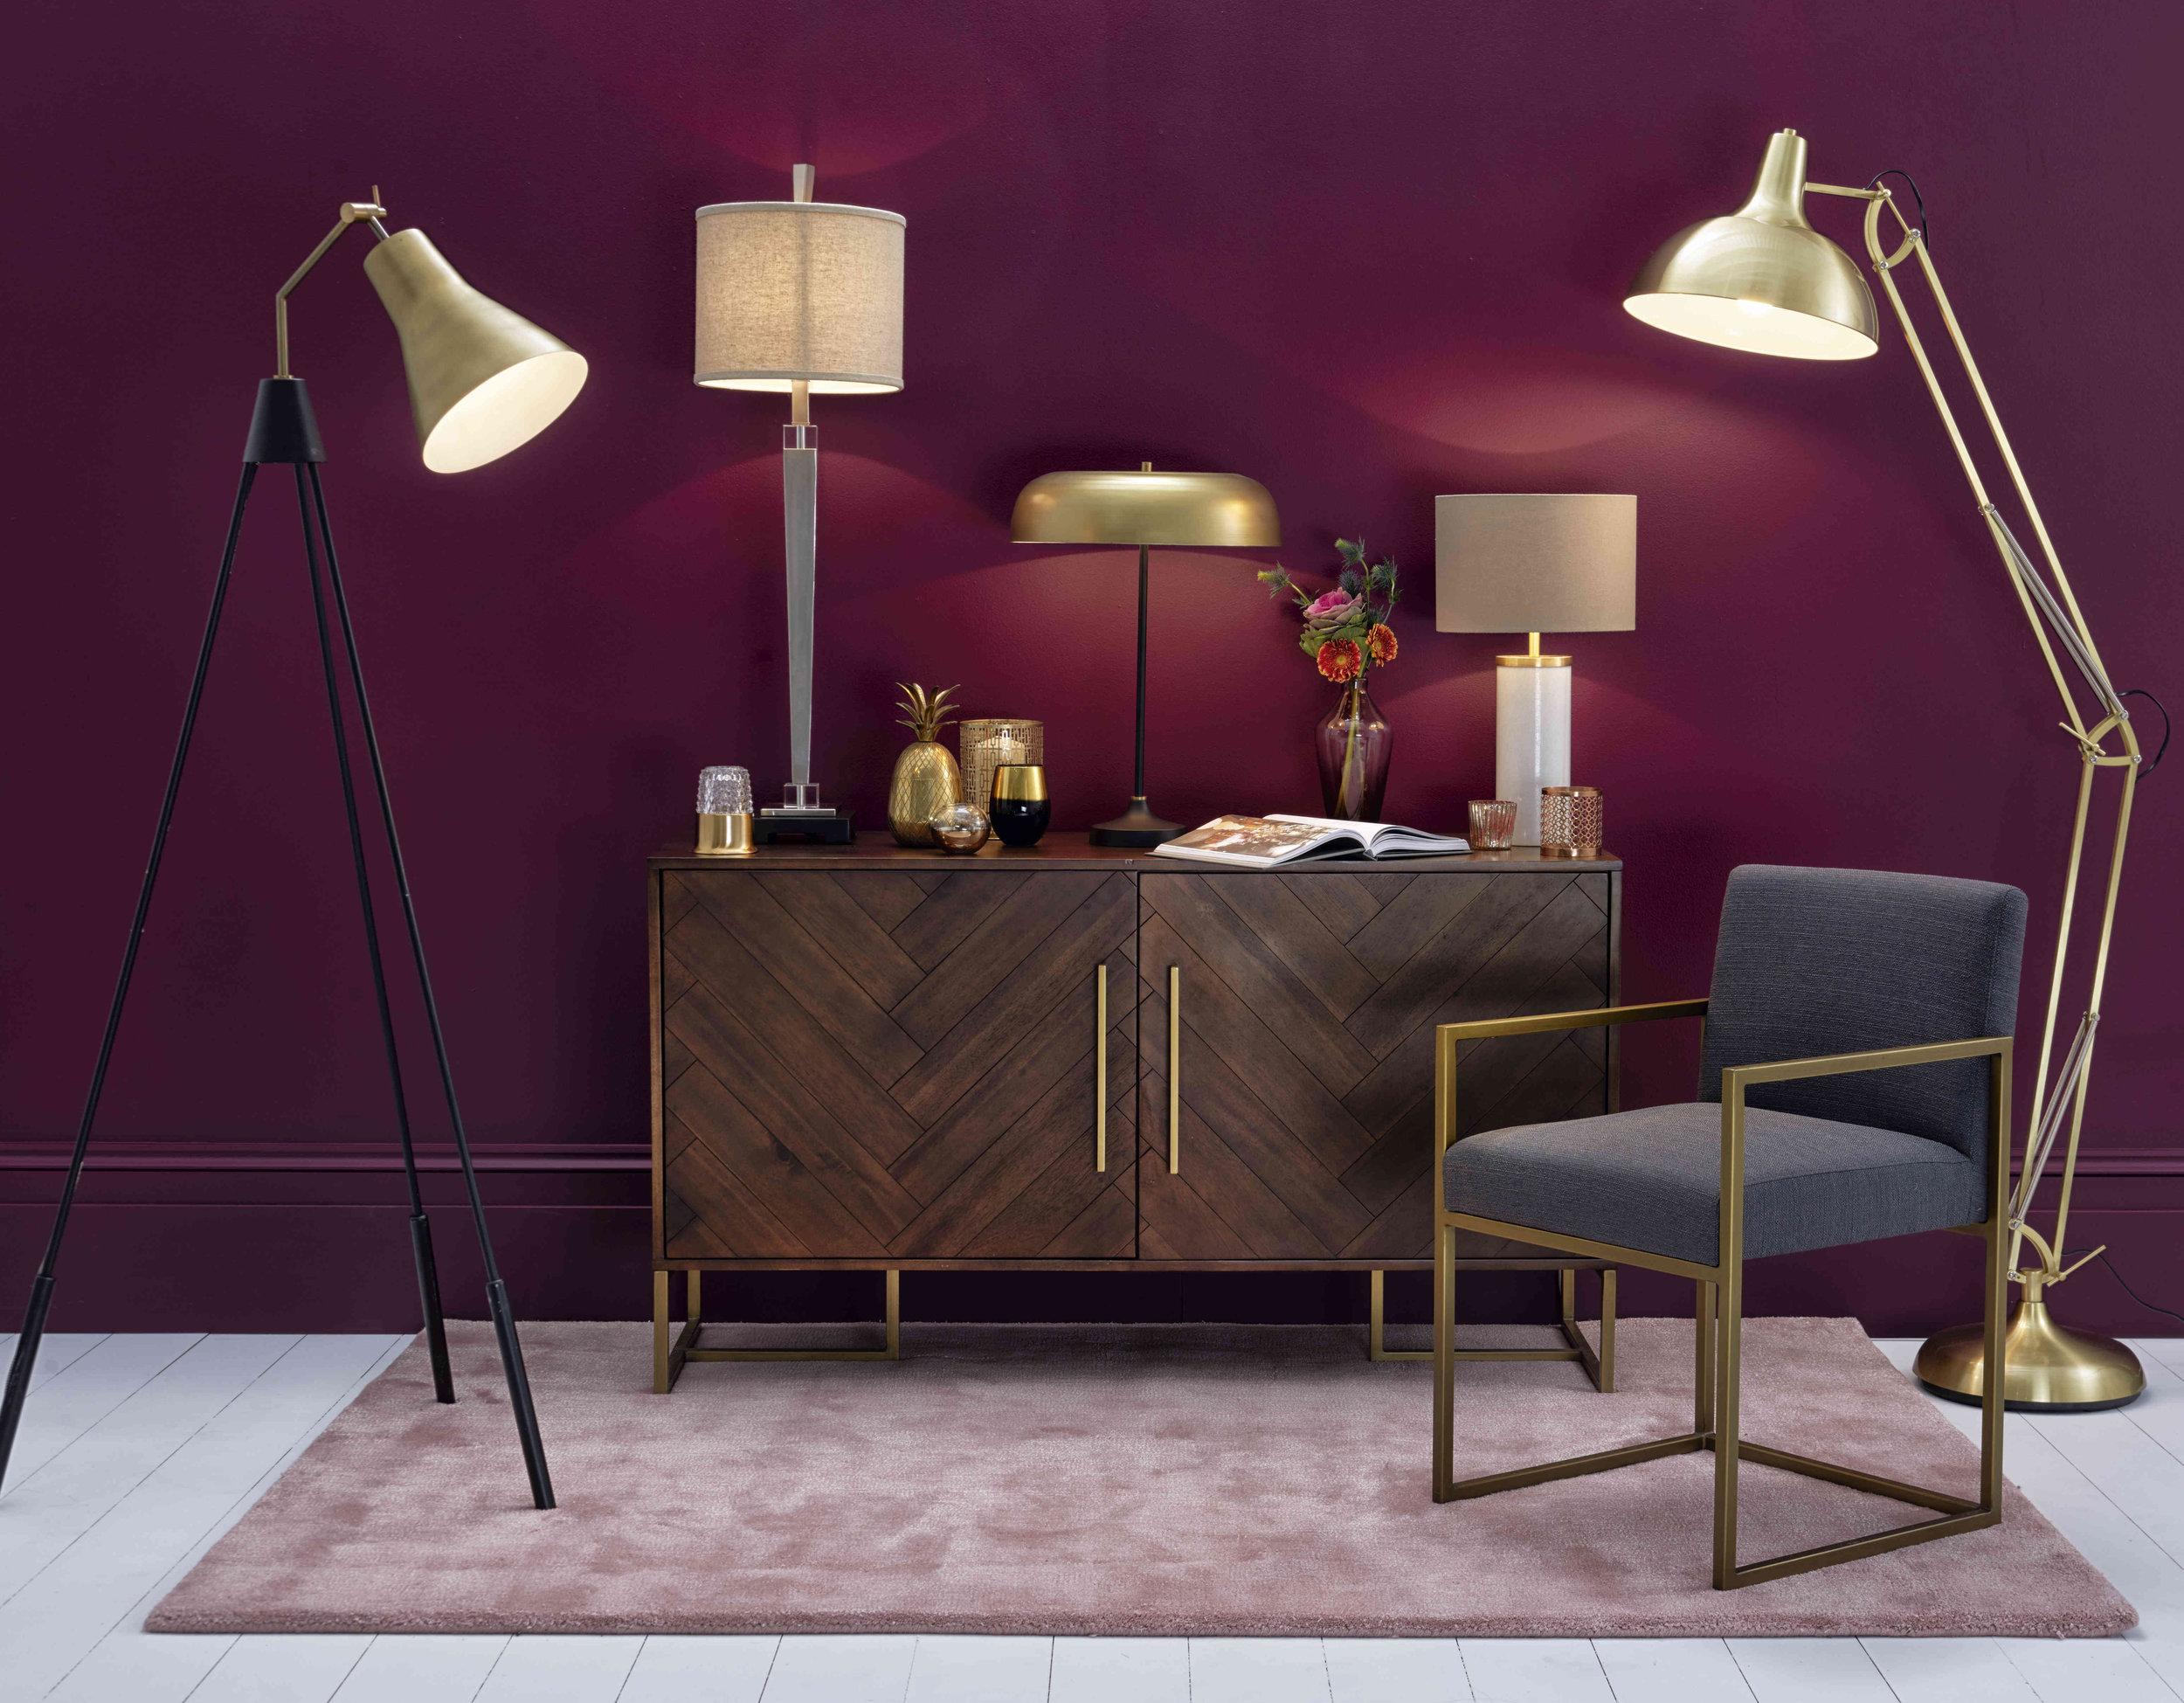 icon-artist-management-nu-valado-commissions-furniture-village-2018-004.jpg